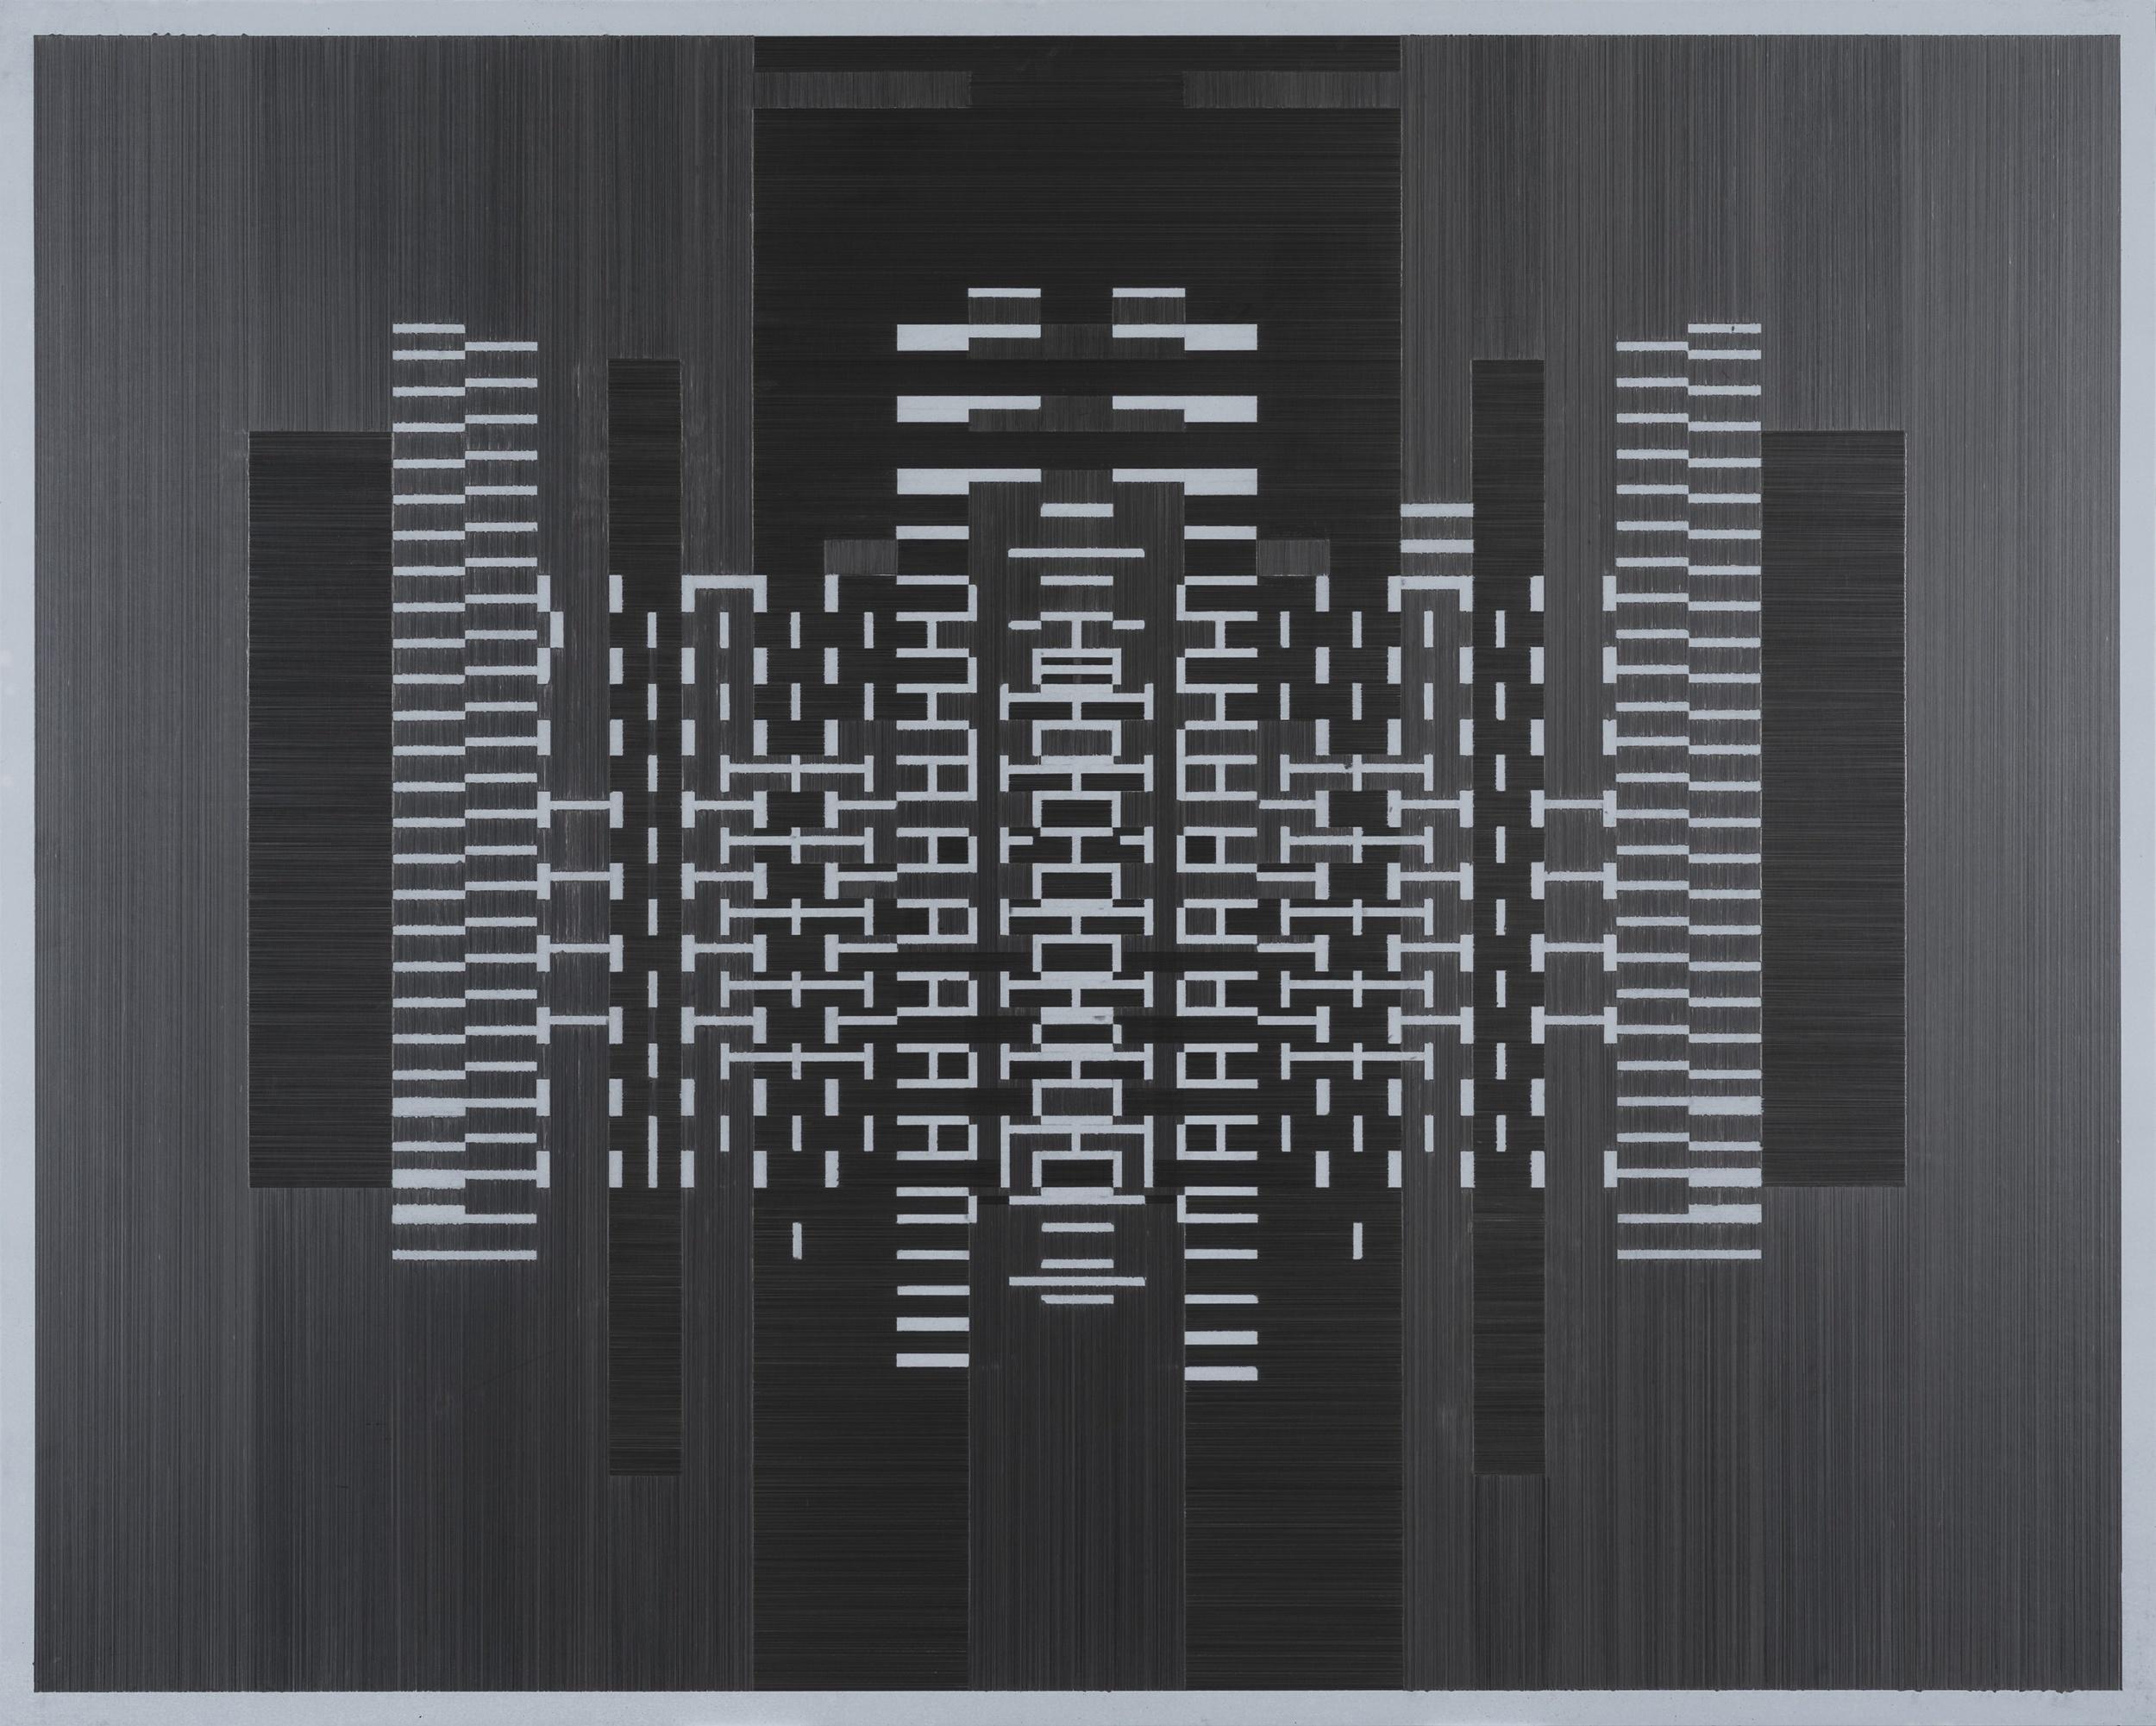 Joseph Huppert,  UntitledI  , 2015,   graphite on mylar,40 x 60 inches